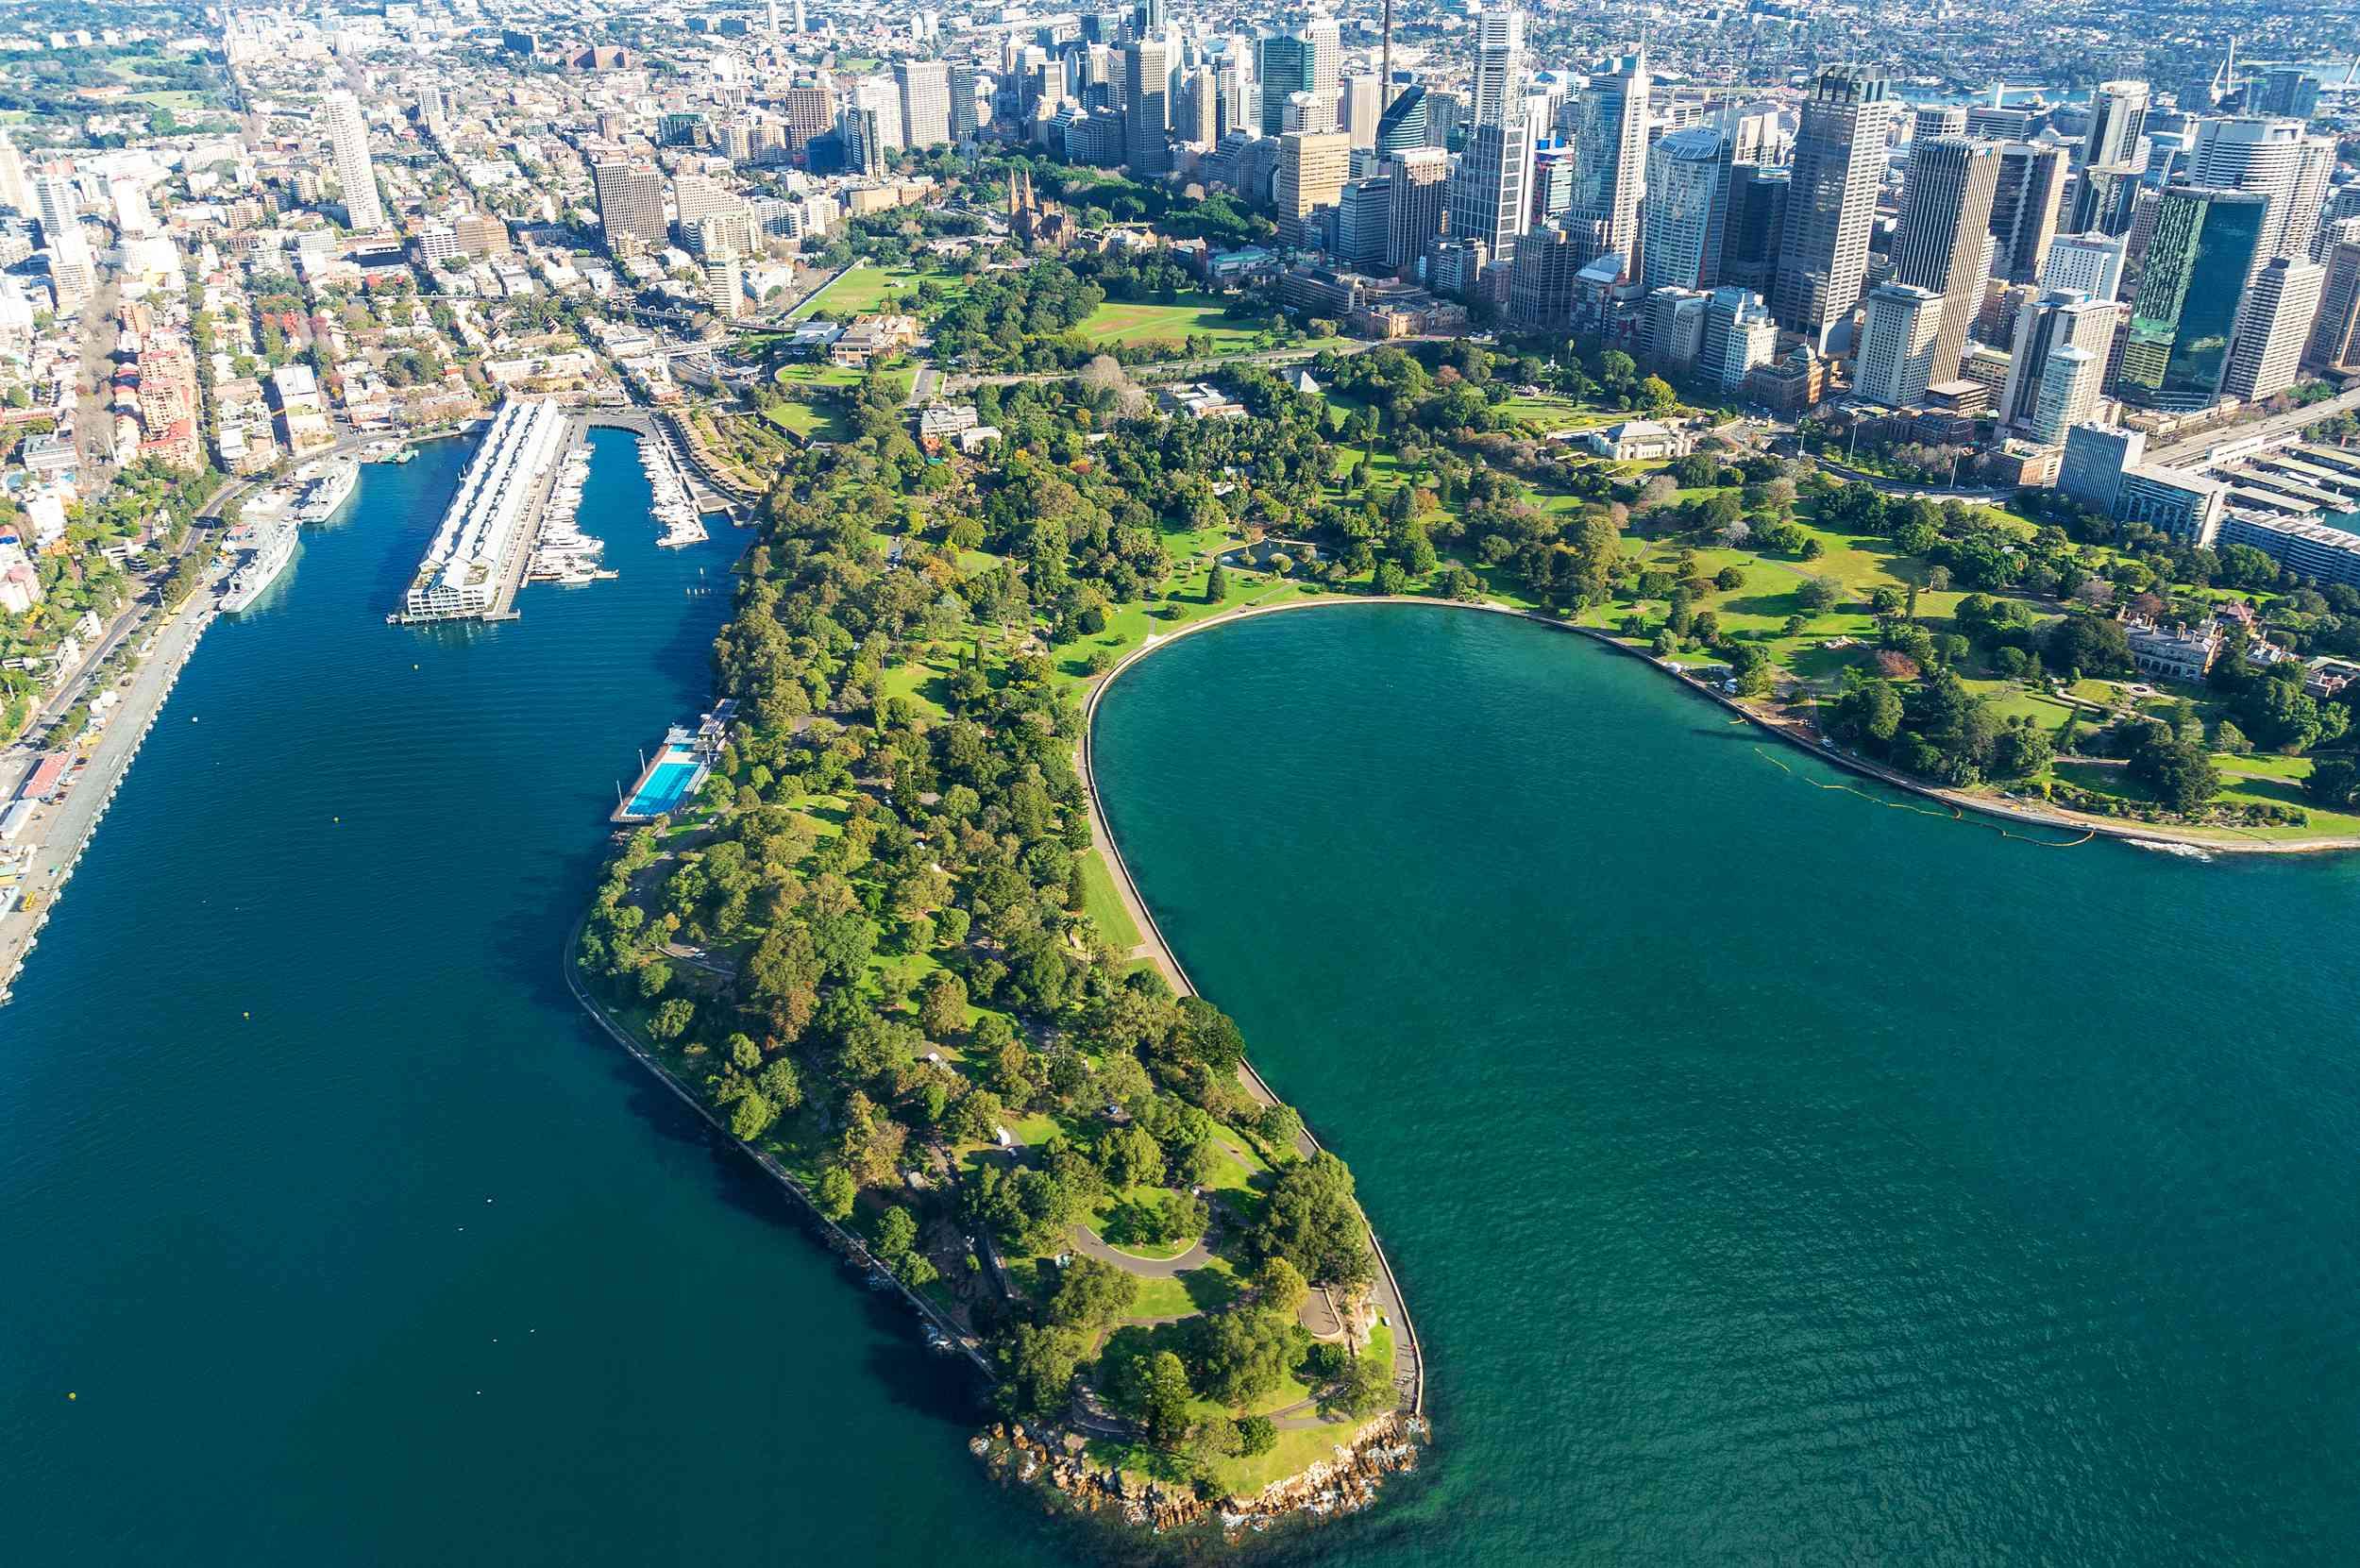 Aerial view of the Royal Botanic Gardens, Sydney